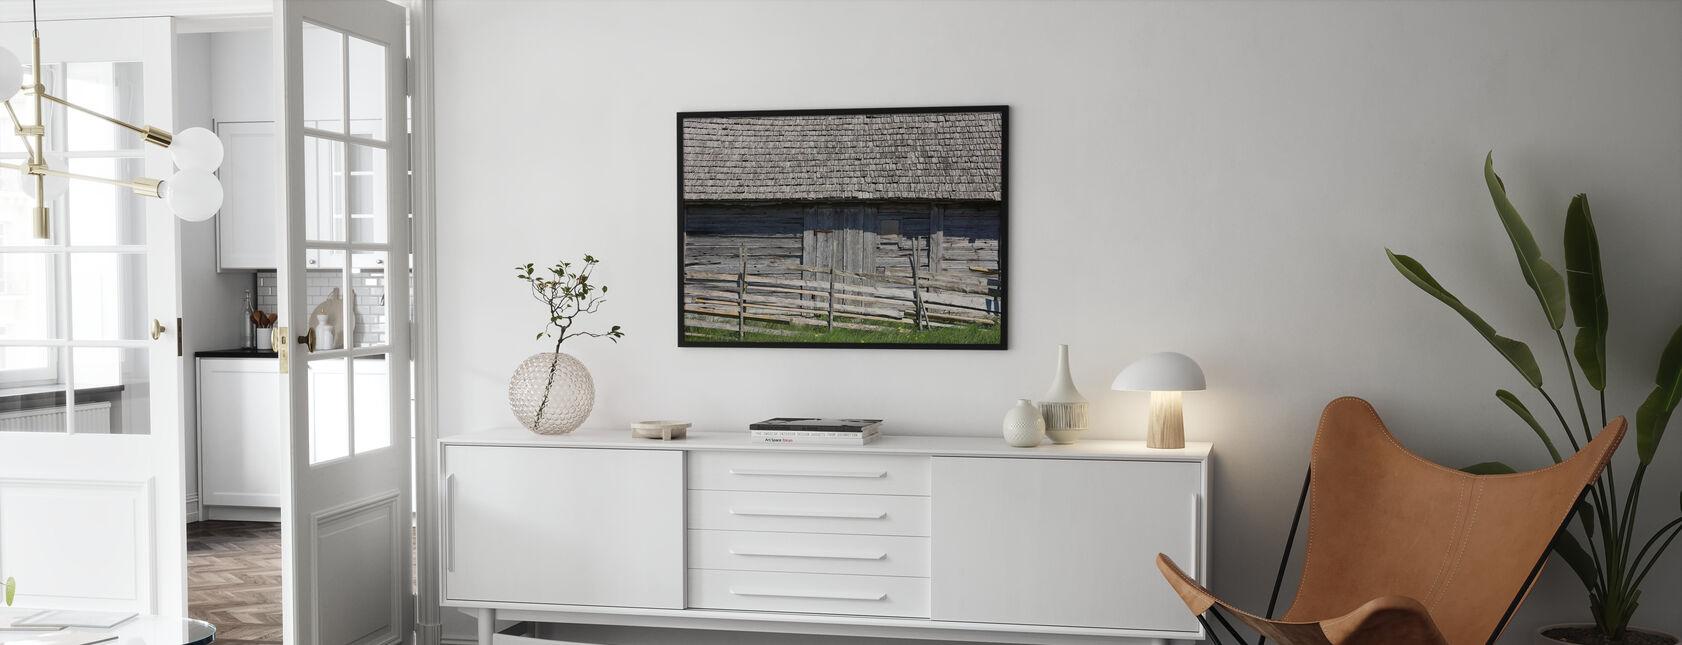 Old Grain Store - Poster - Living Room